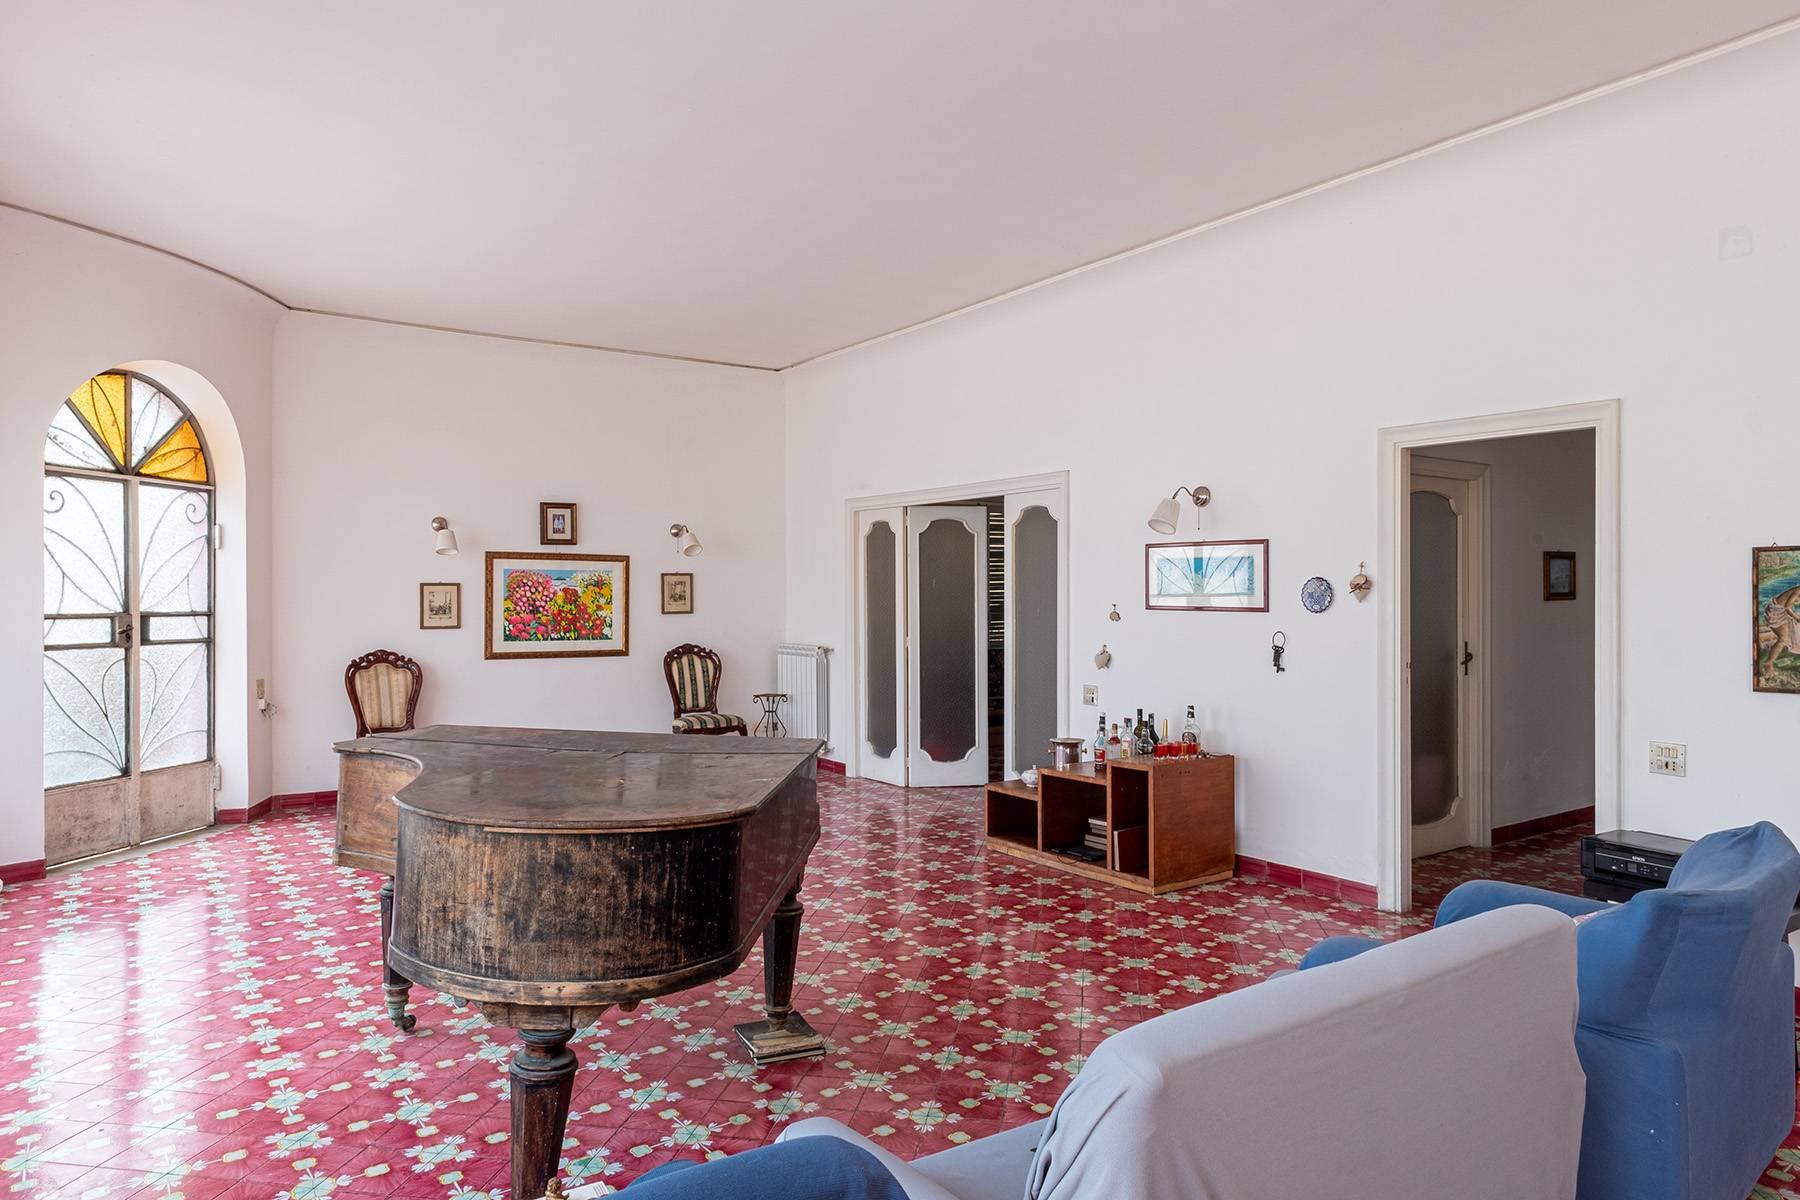 Casa indipendente in Vendita a Procida: 5 locali, 300 mq - Foto 3